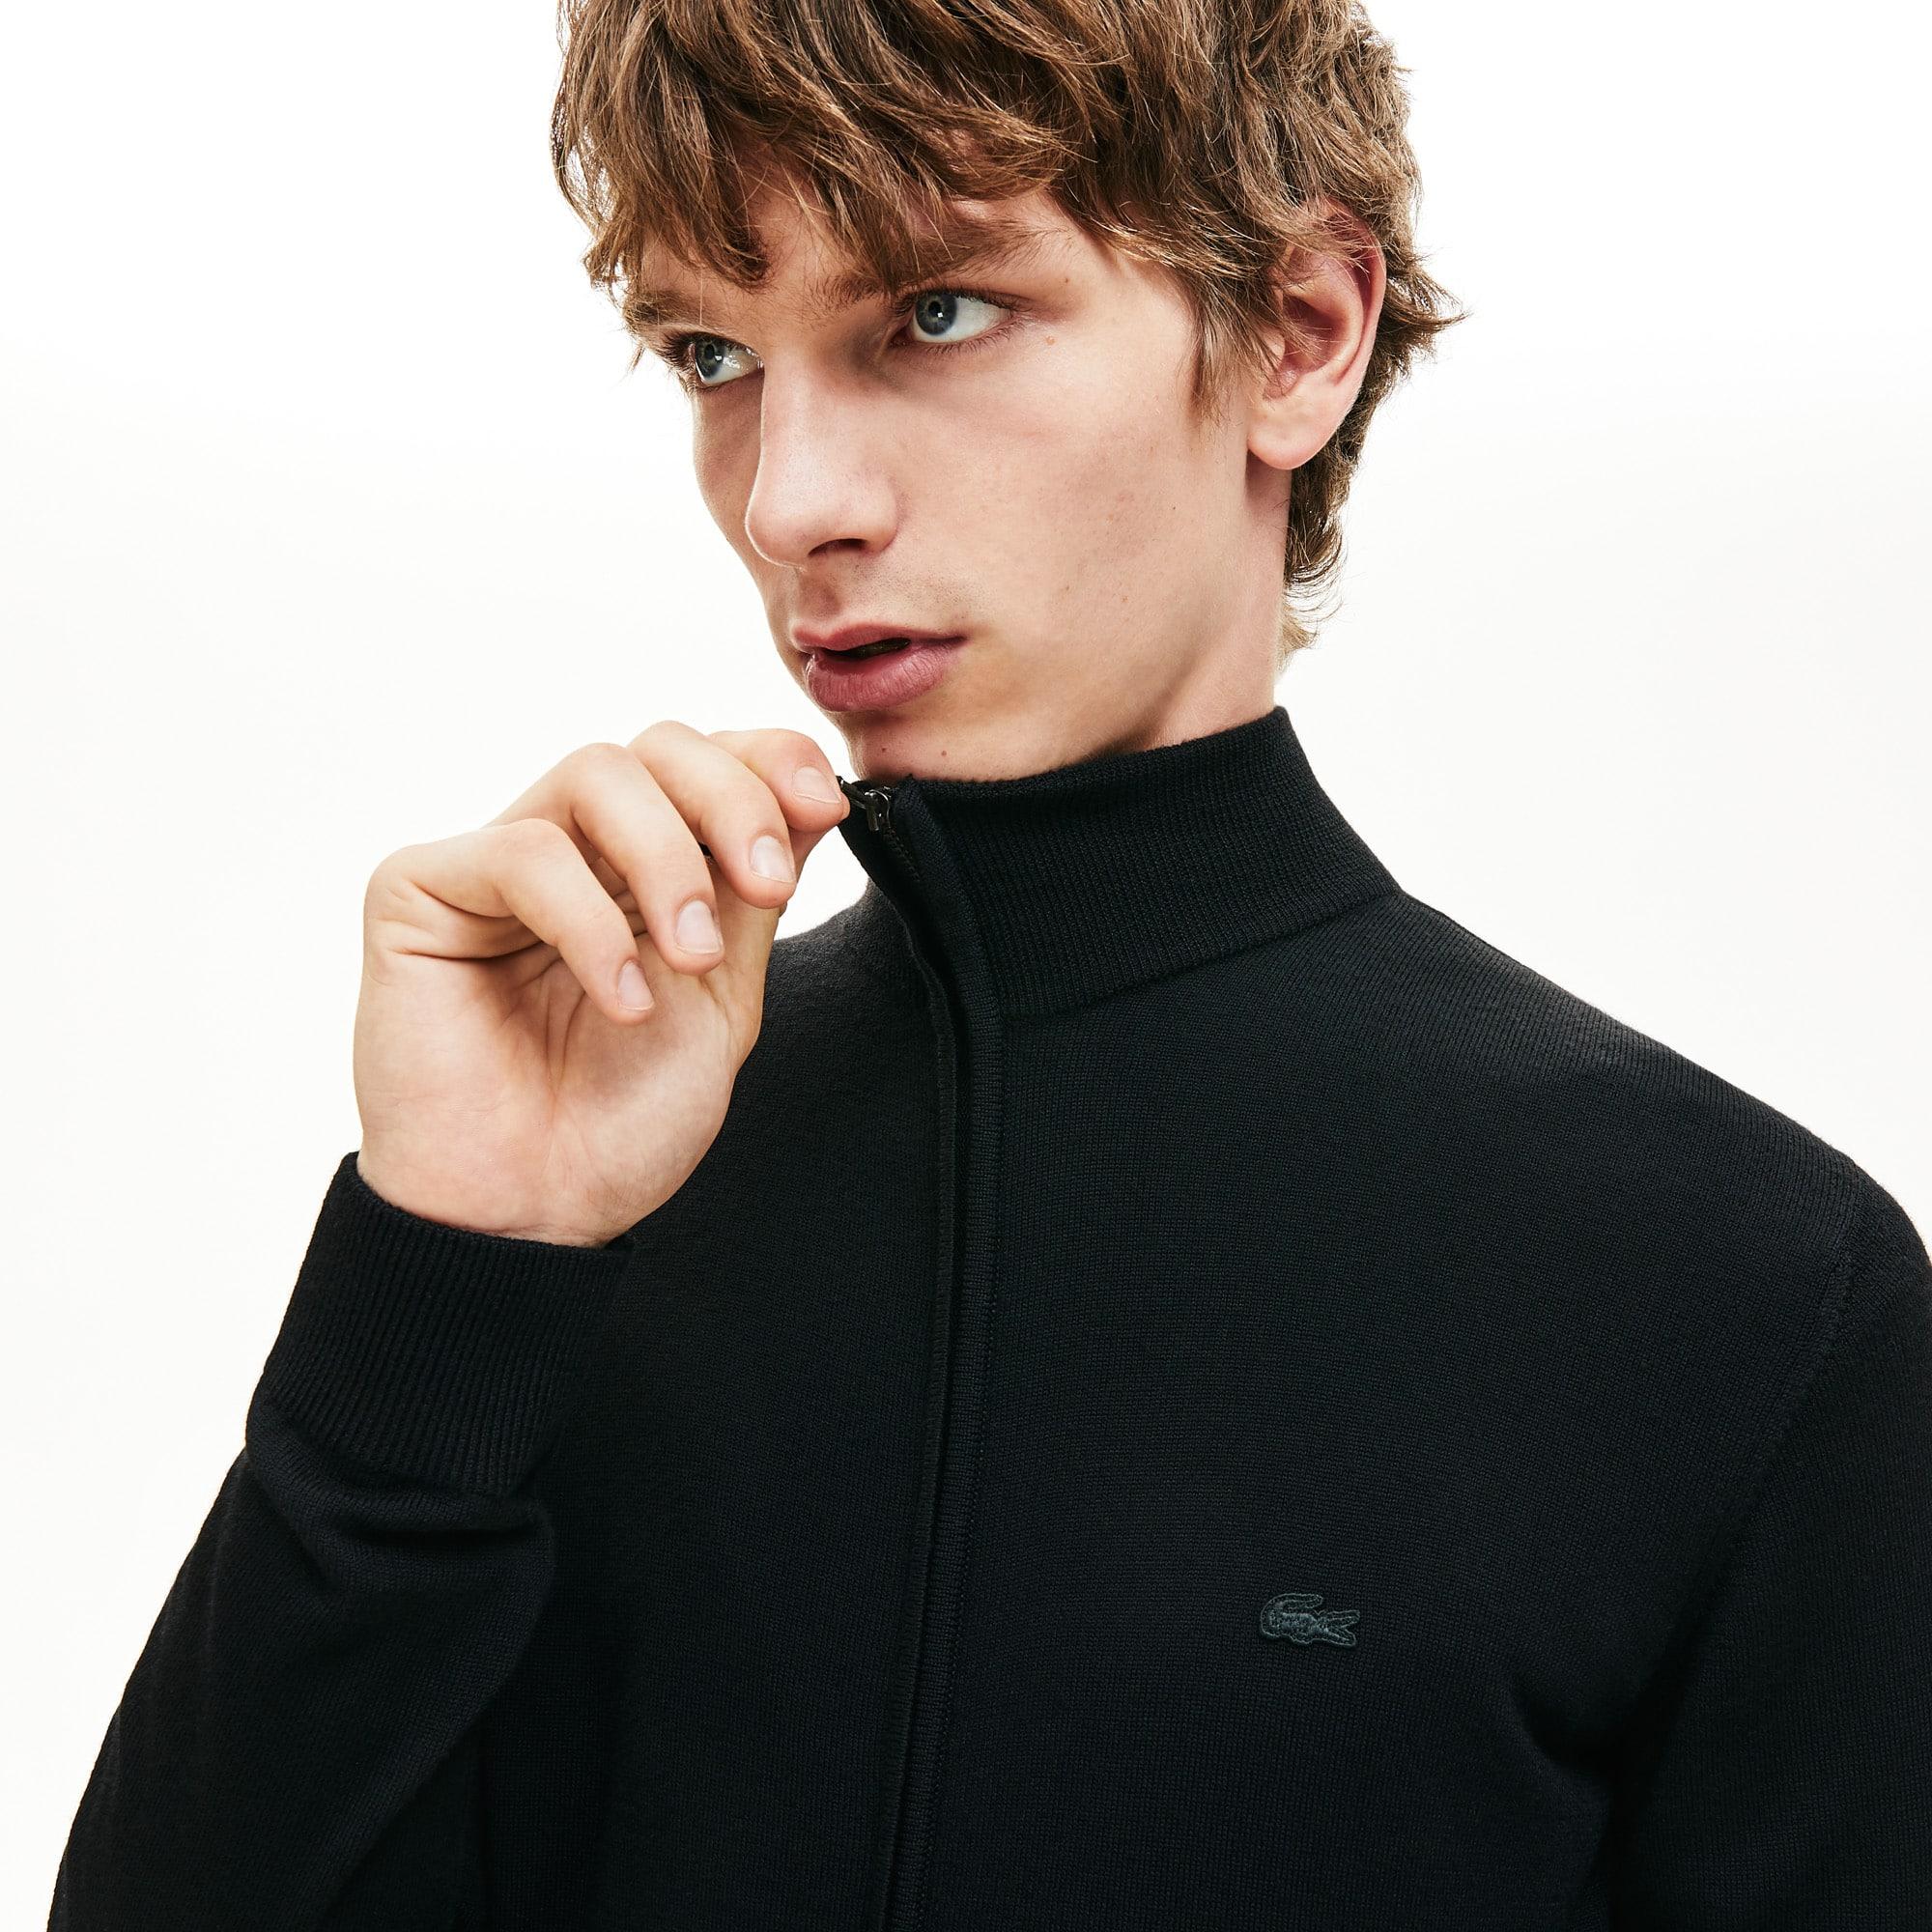 Men's Stand-Up Collar Wool Jersey Zippered Cardigan